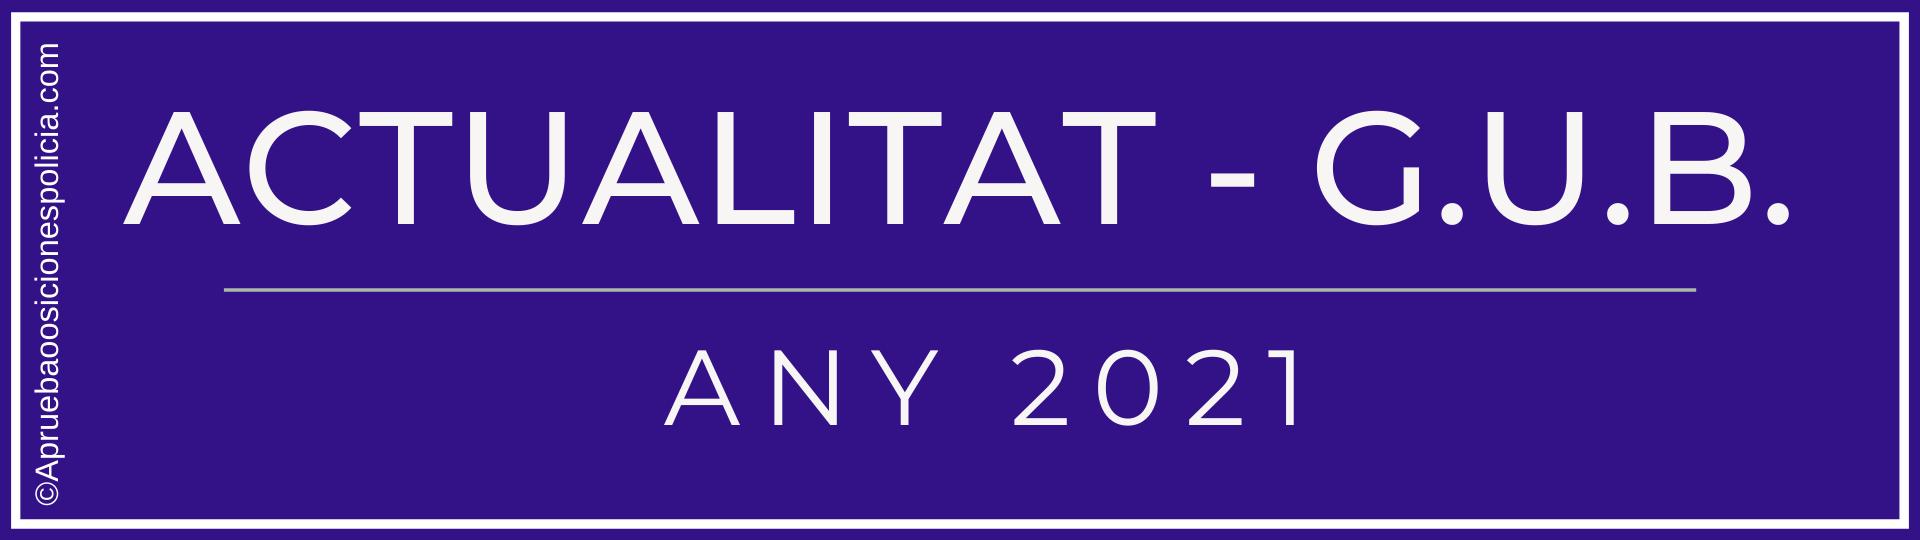 Actualidad Guardia Urbana Barcelona 2021